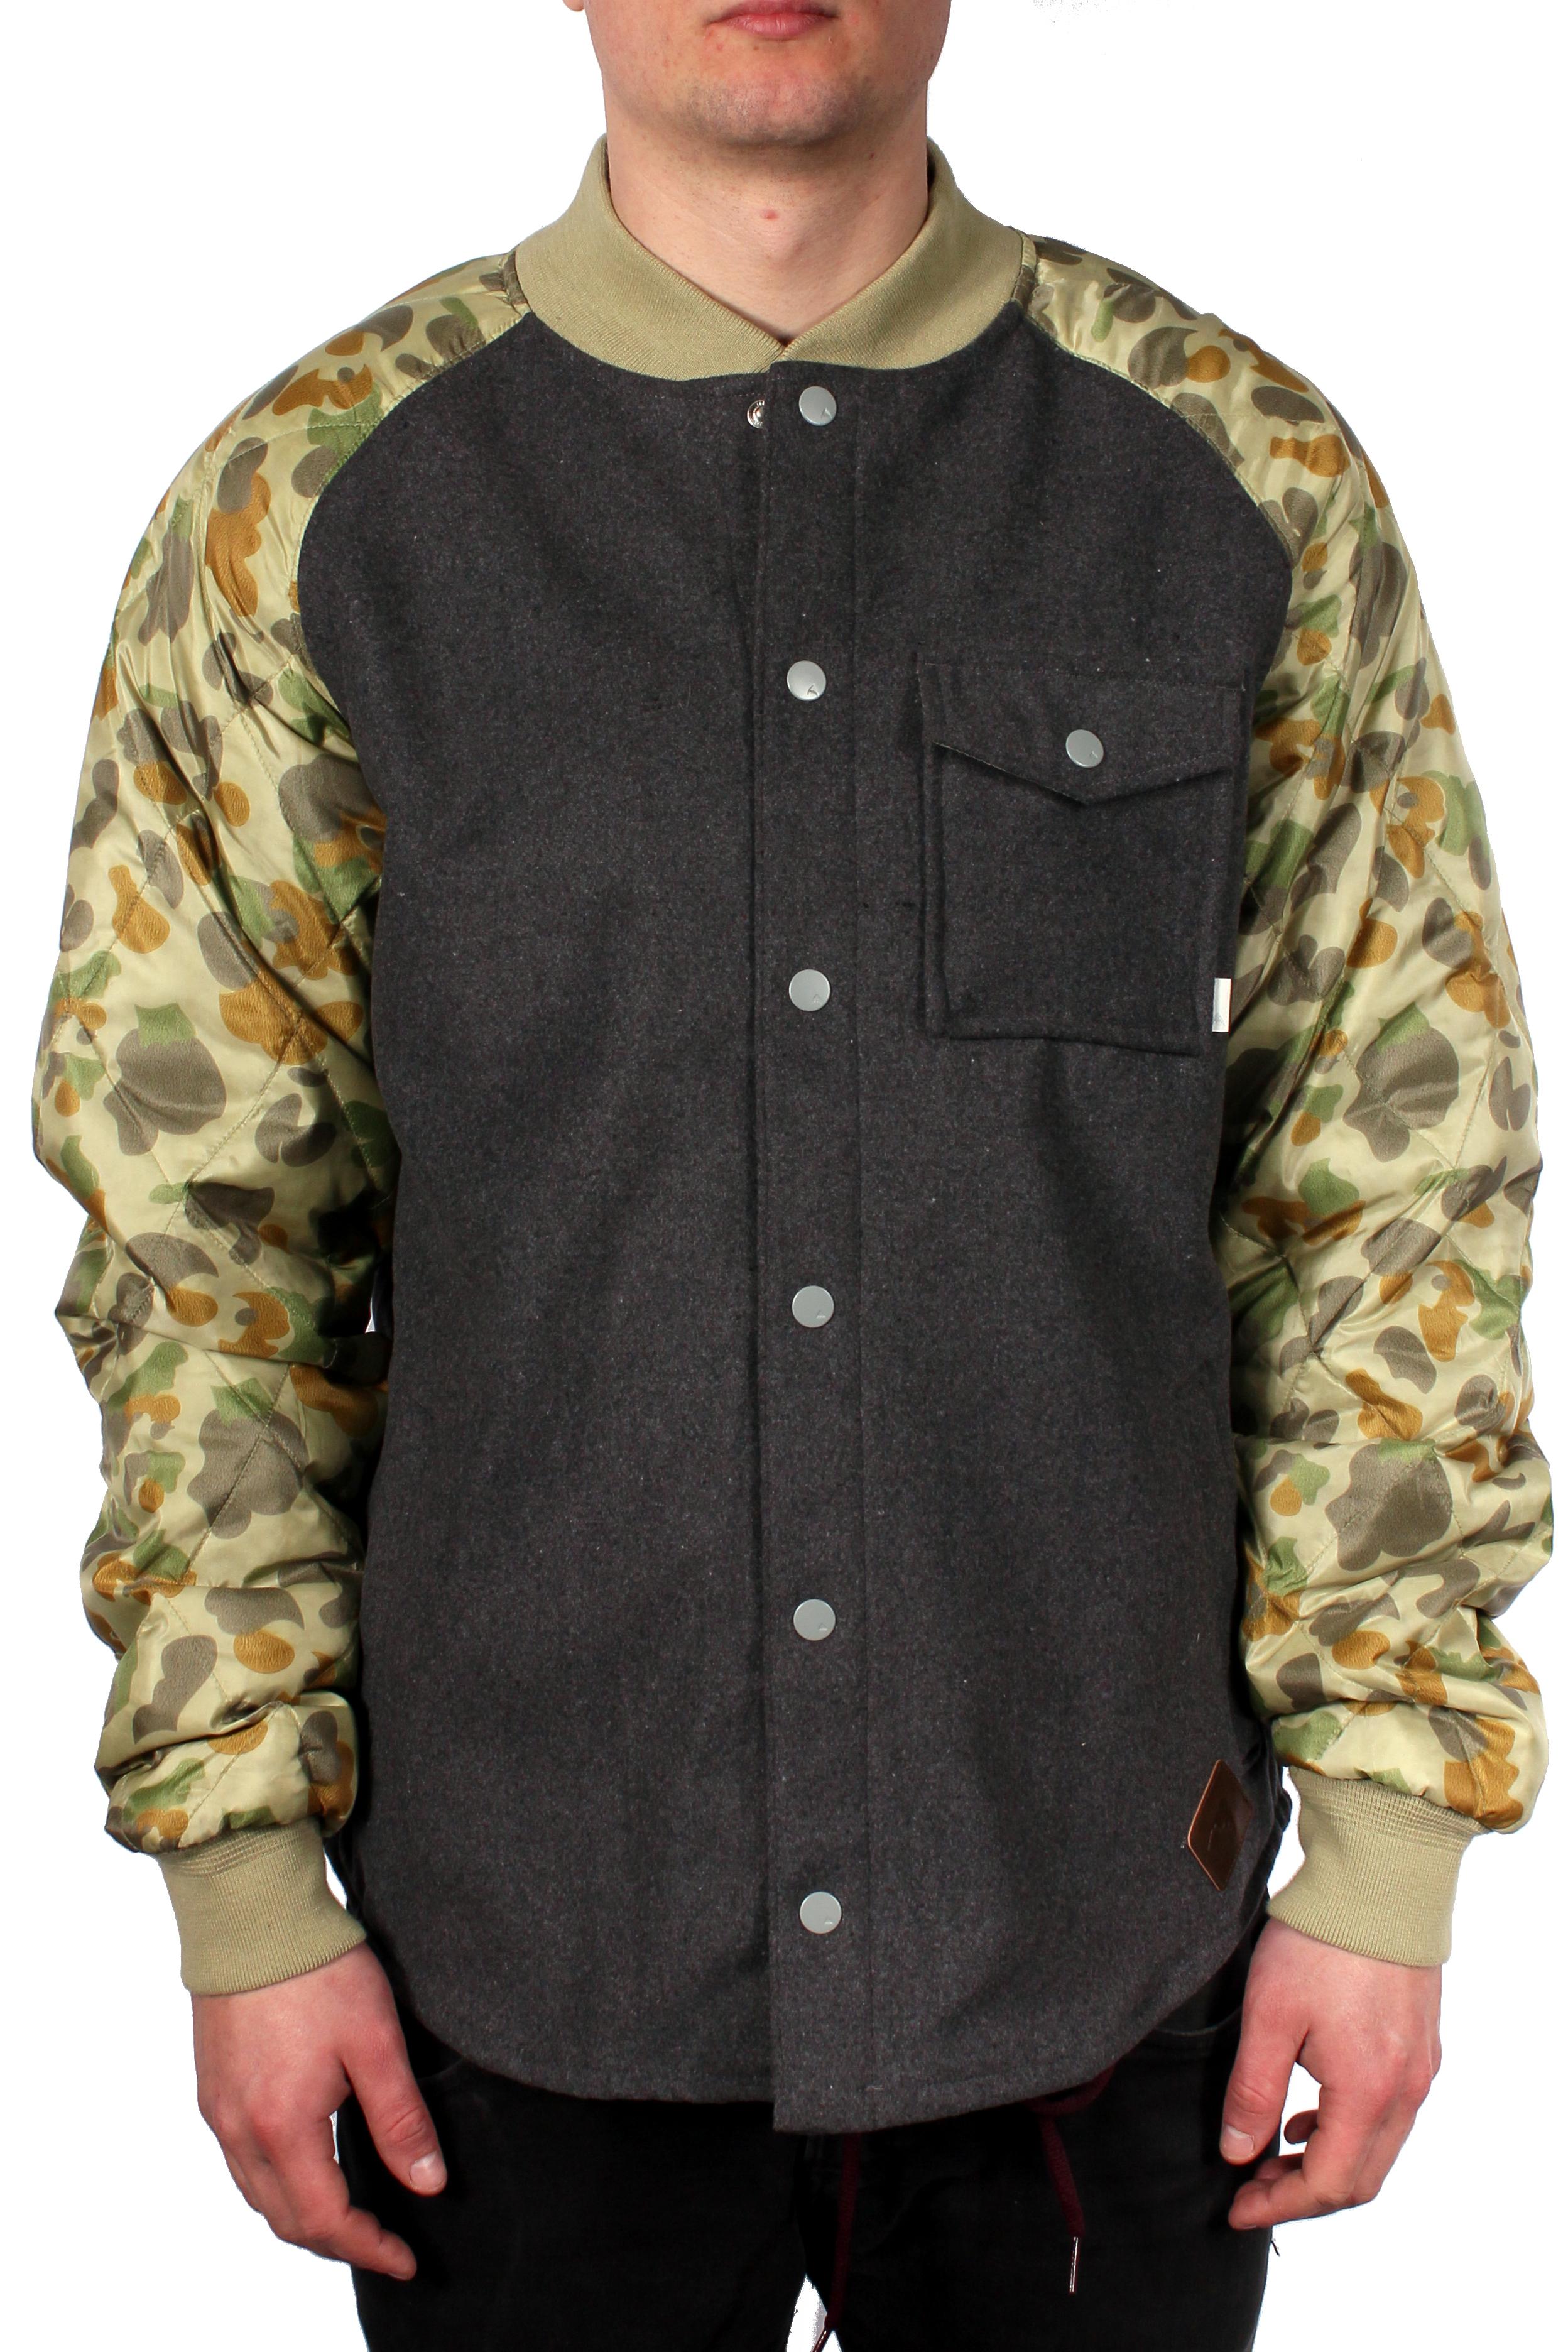 Bluza Ocieplana Burton Ackley Flannel (Ash Heather)